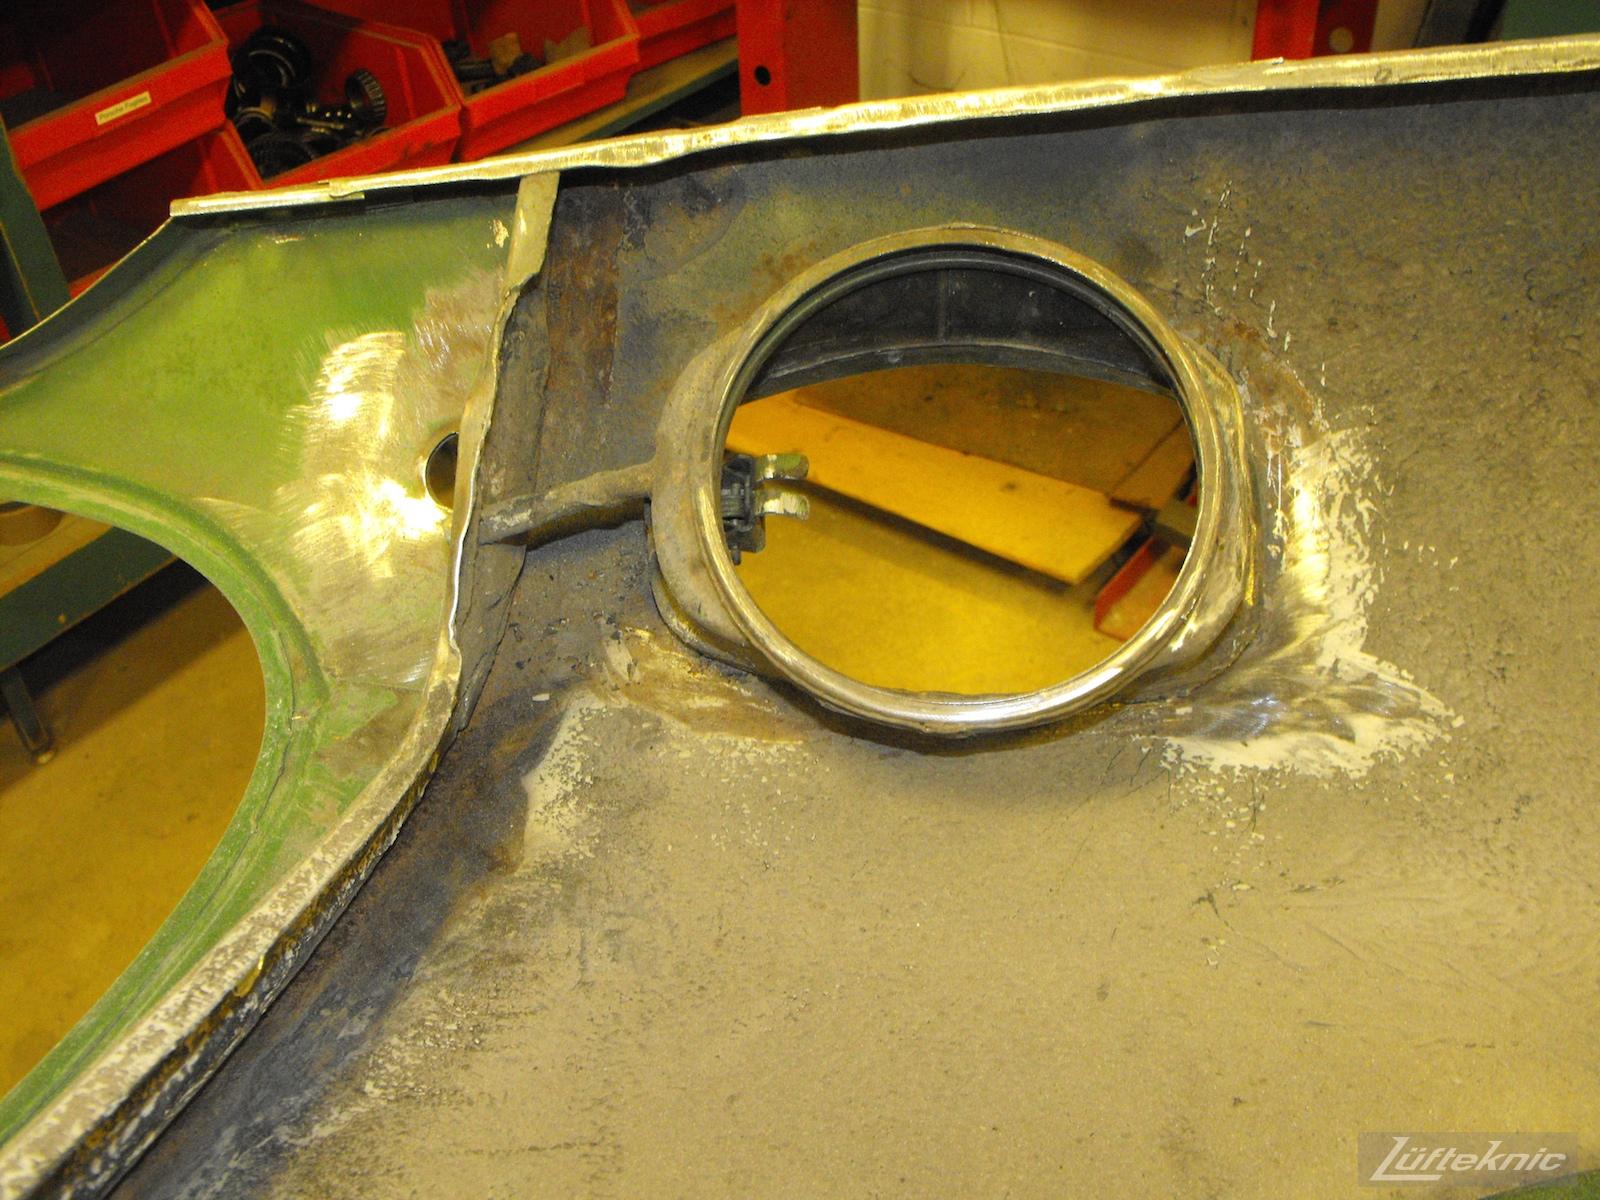 Front fender repair on an Irish Green Porsche 912 undergoing restoration at Lufteknic.